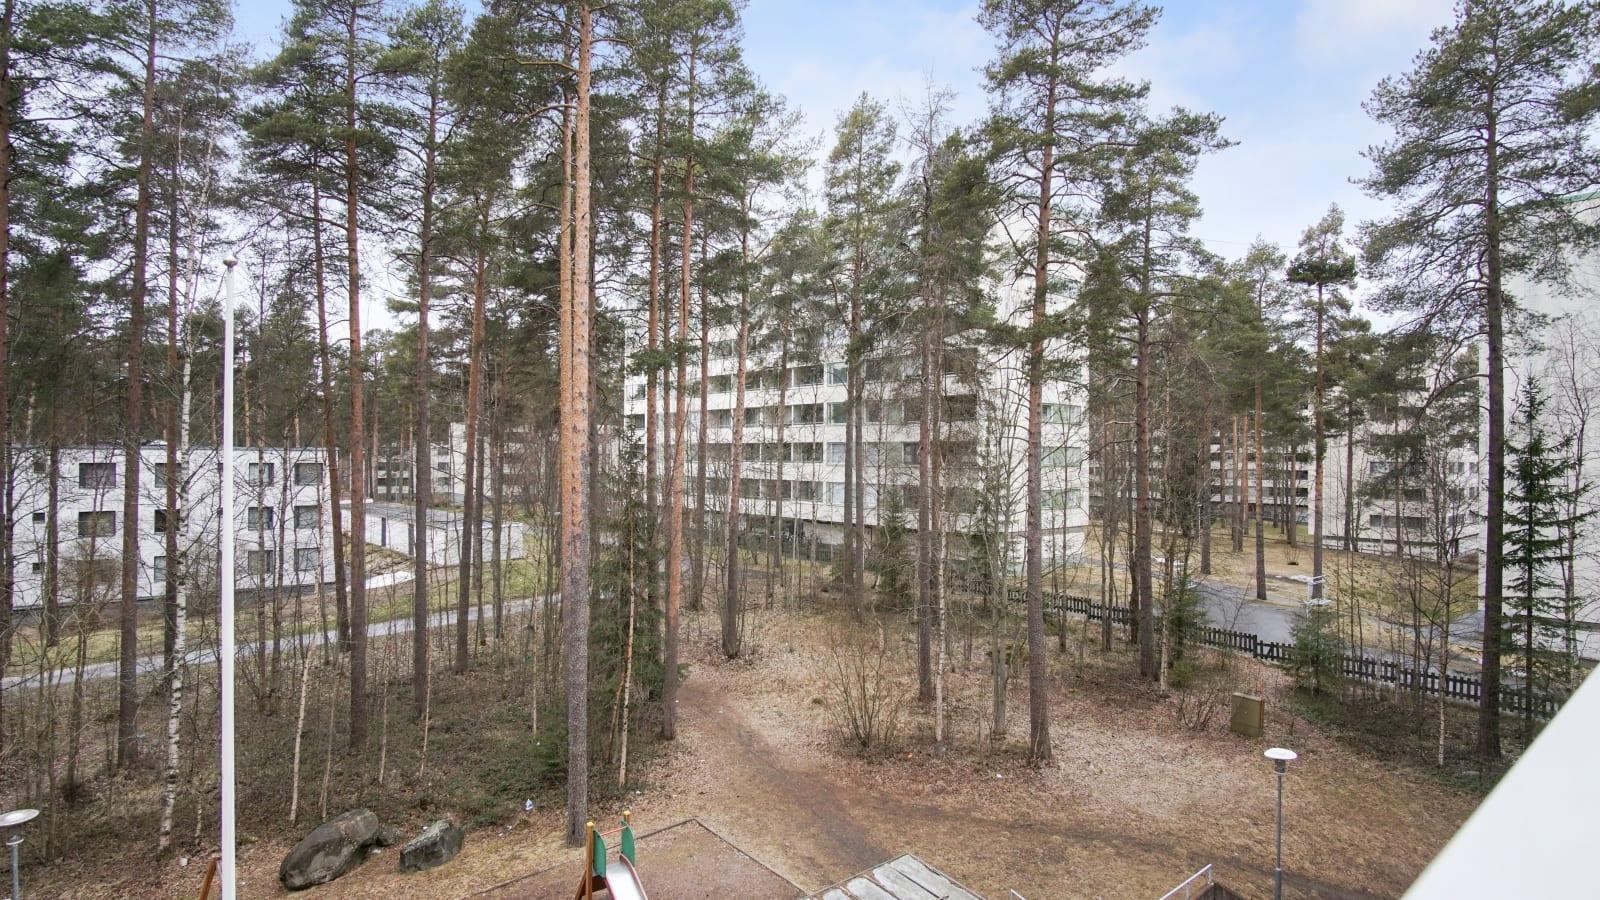 Oulu, Kaukovainio, Tuulihaukantie 9